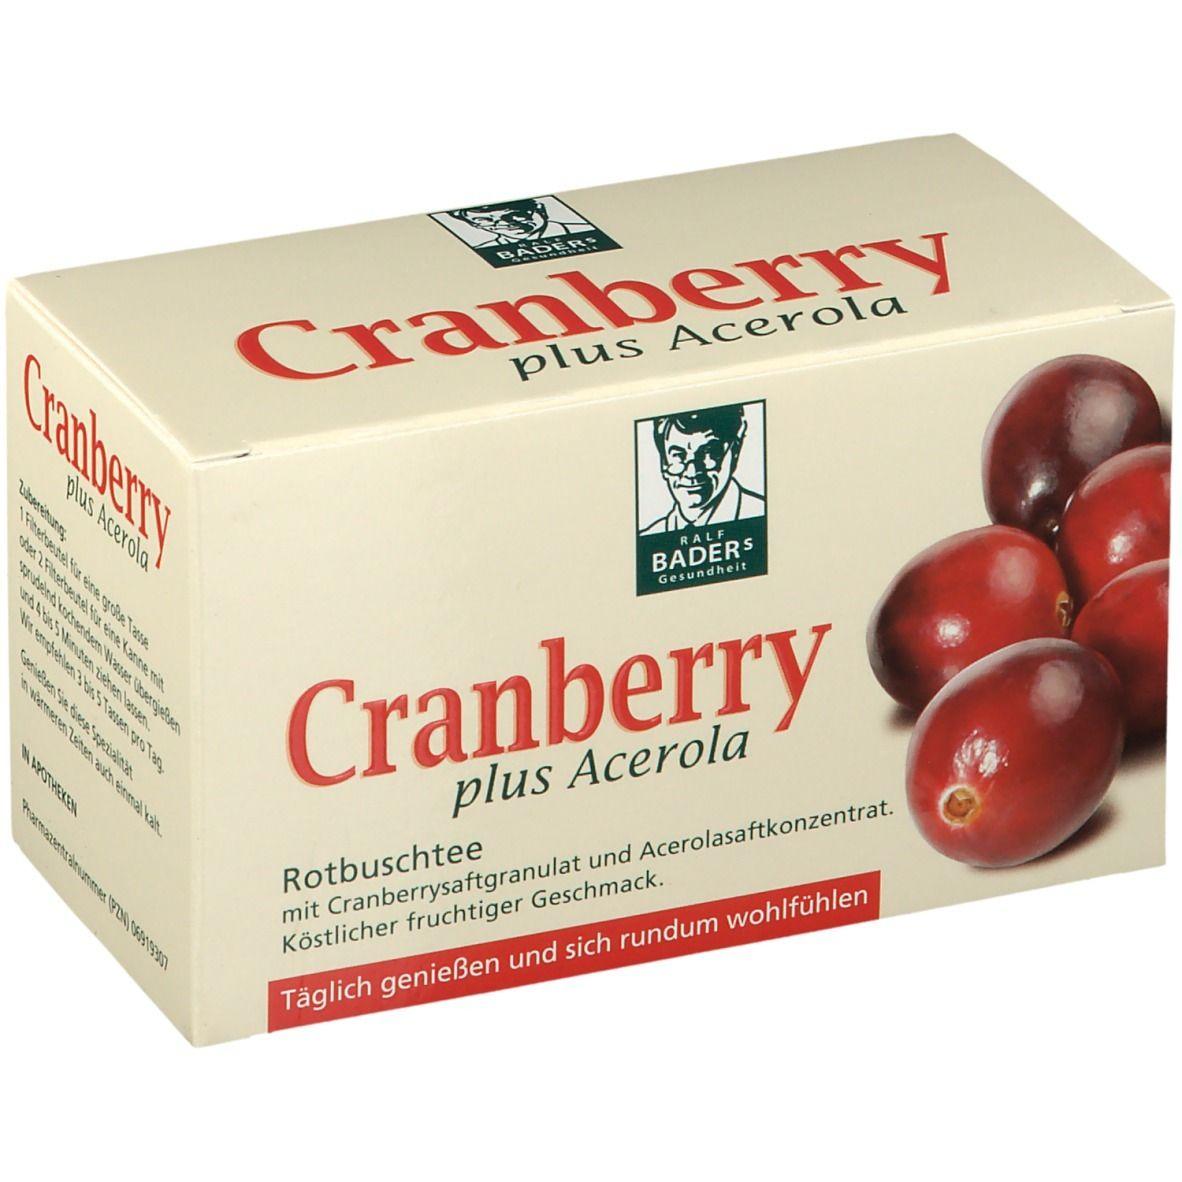 Image of BADERs Cranberry Acerola Filterbeutel